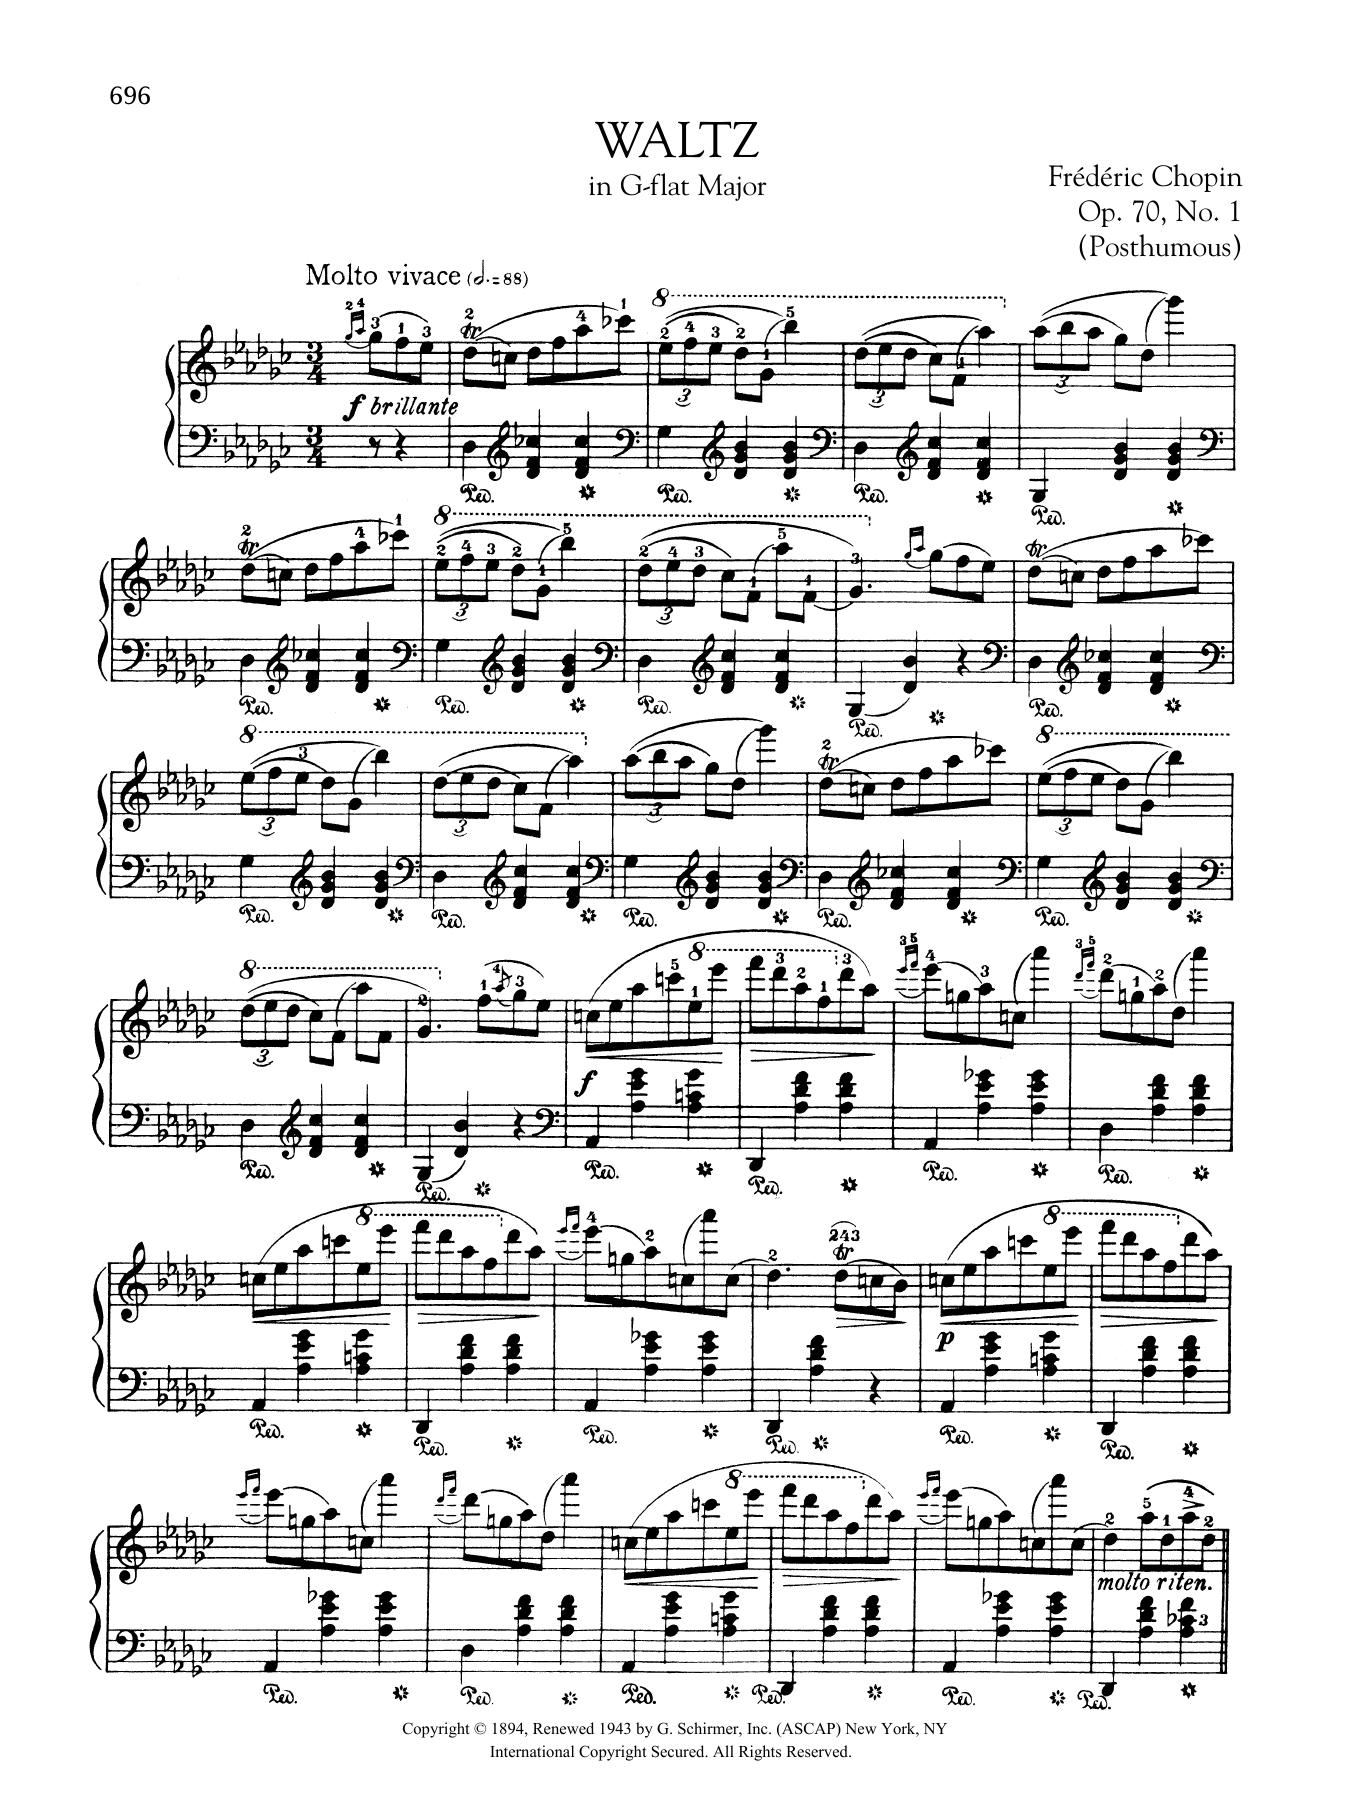 Waltz in G-flat Major, Op. 70, No. 1 (Posthumous) Sheet Music